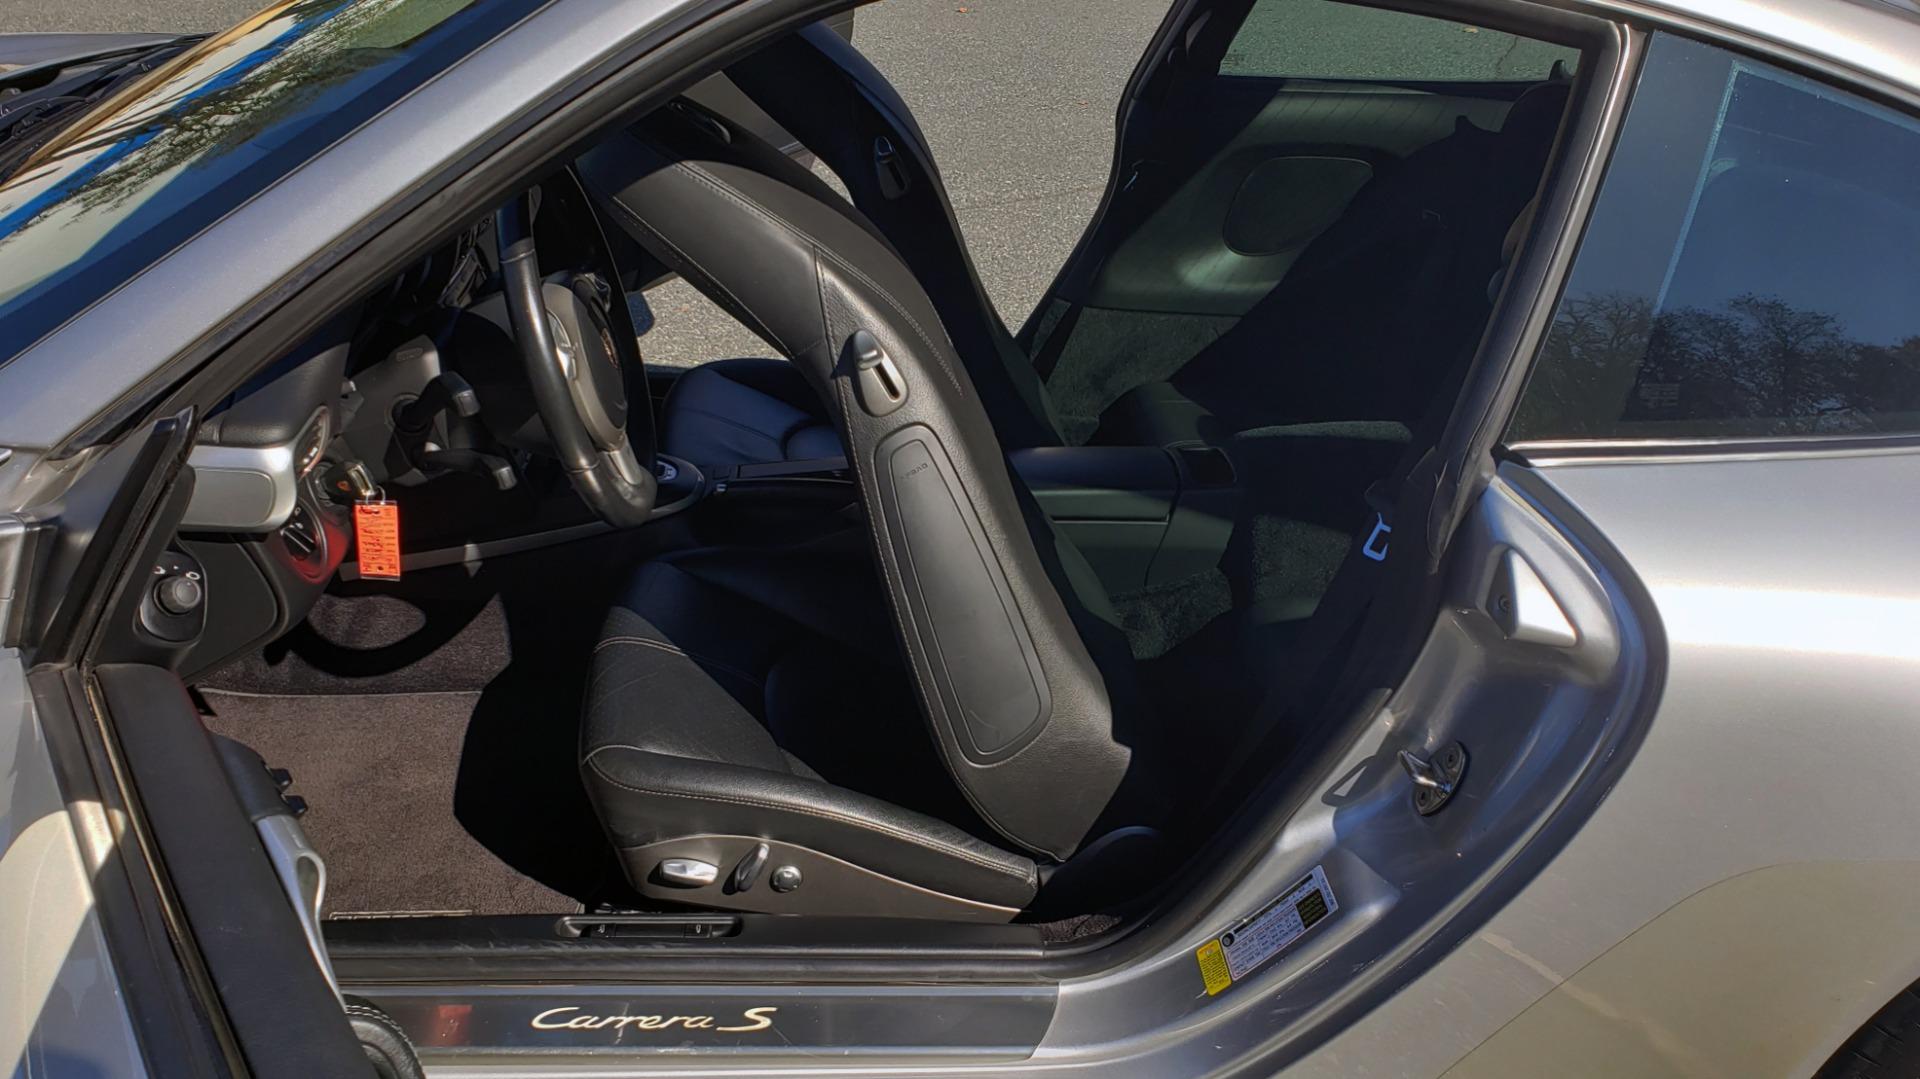 Used 2006 Porsche 911 CARRERA S / 5-SPD AUTO / SPORT CHRONO / NAV / BOSE / SUNROOF for sale Sold at Formula Imports in Charlotte NC 28227 66